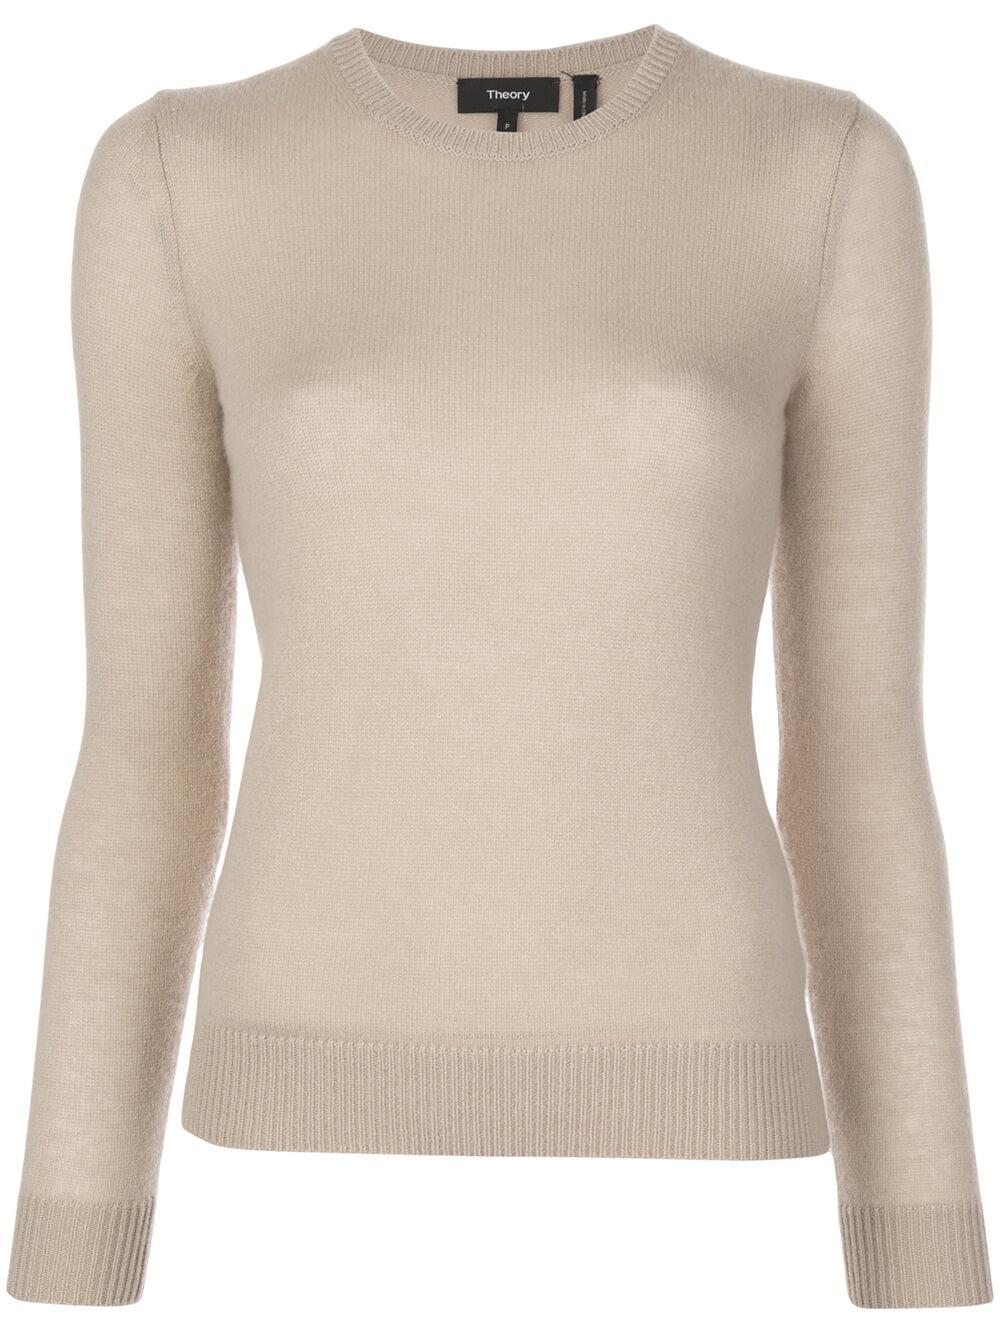 Feather Crew Neck Sweater Item # J0118711-S20